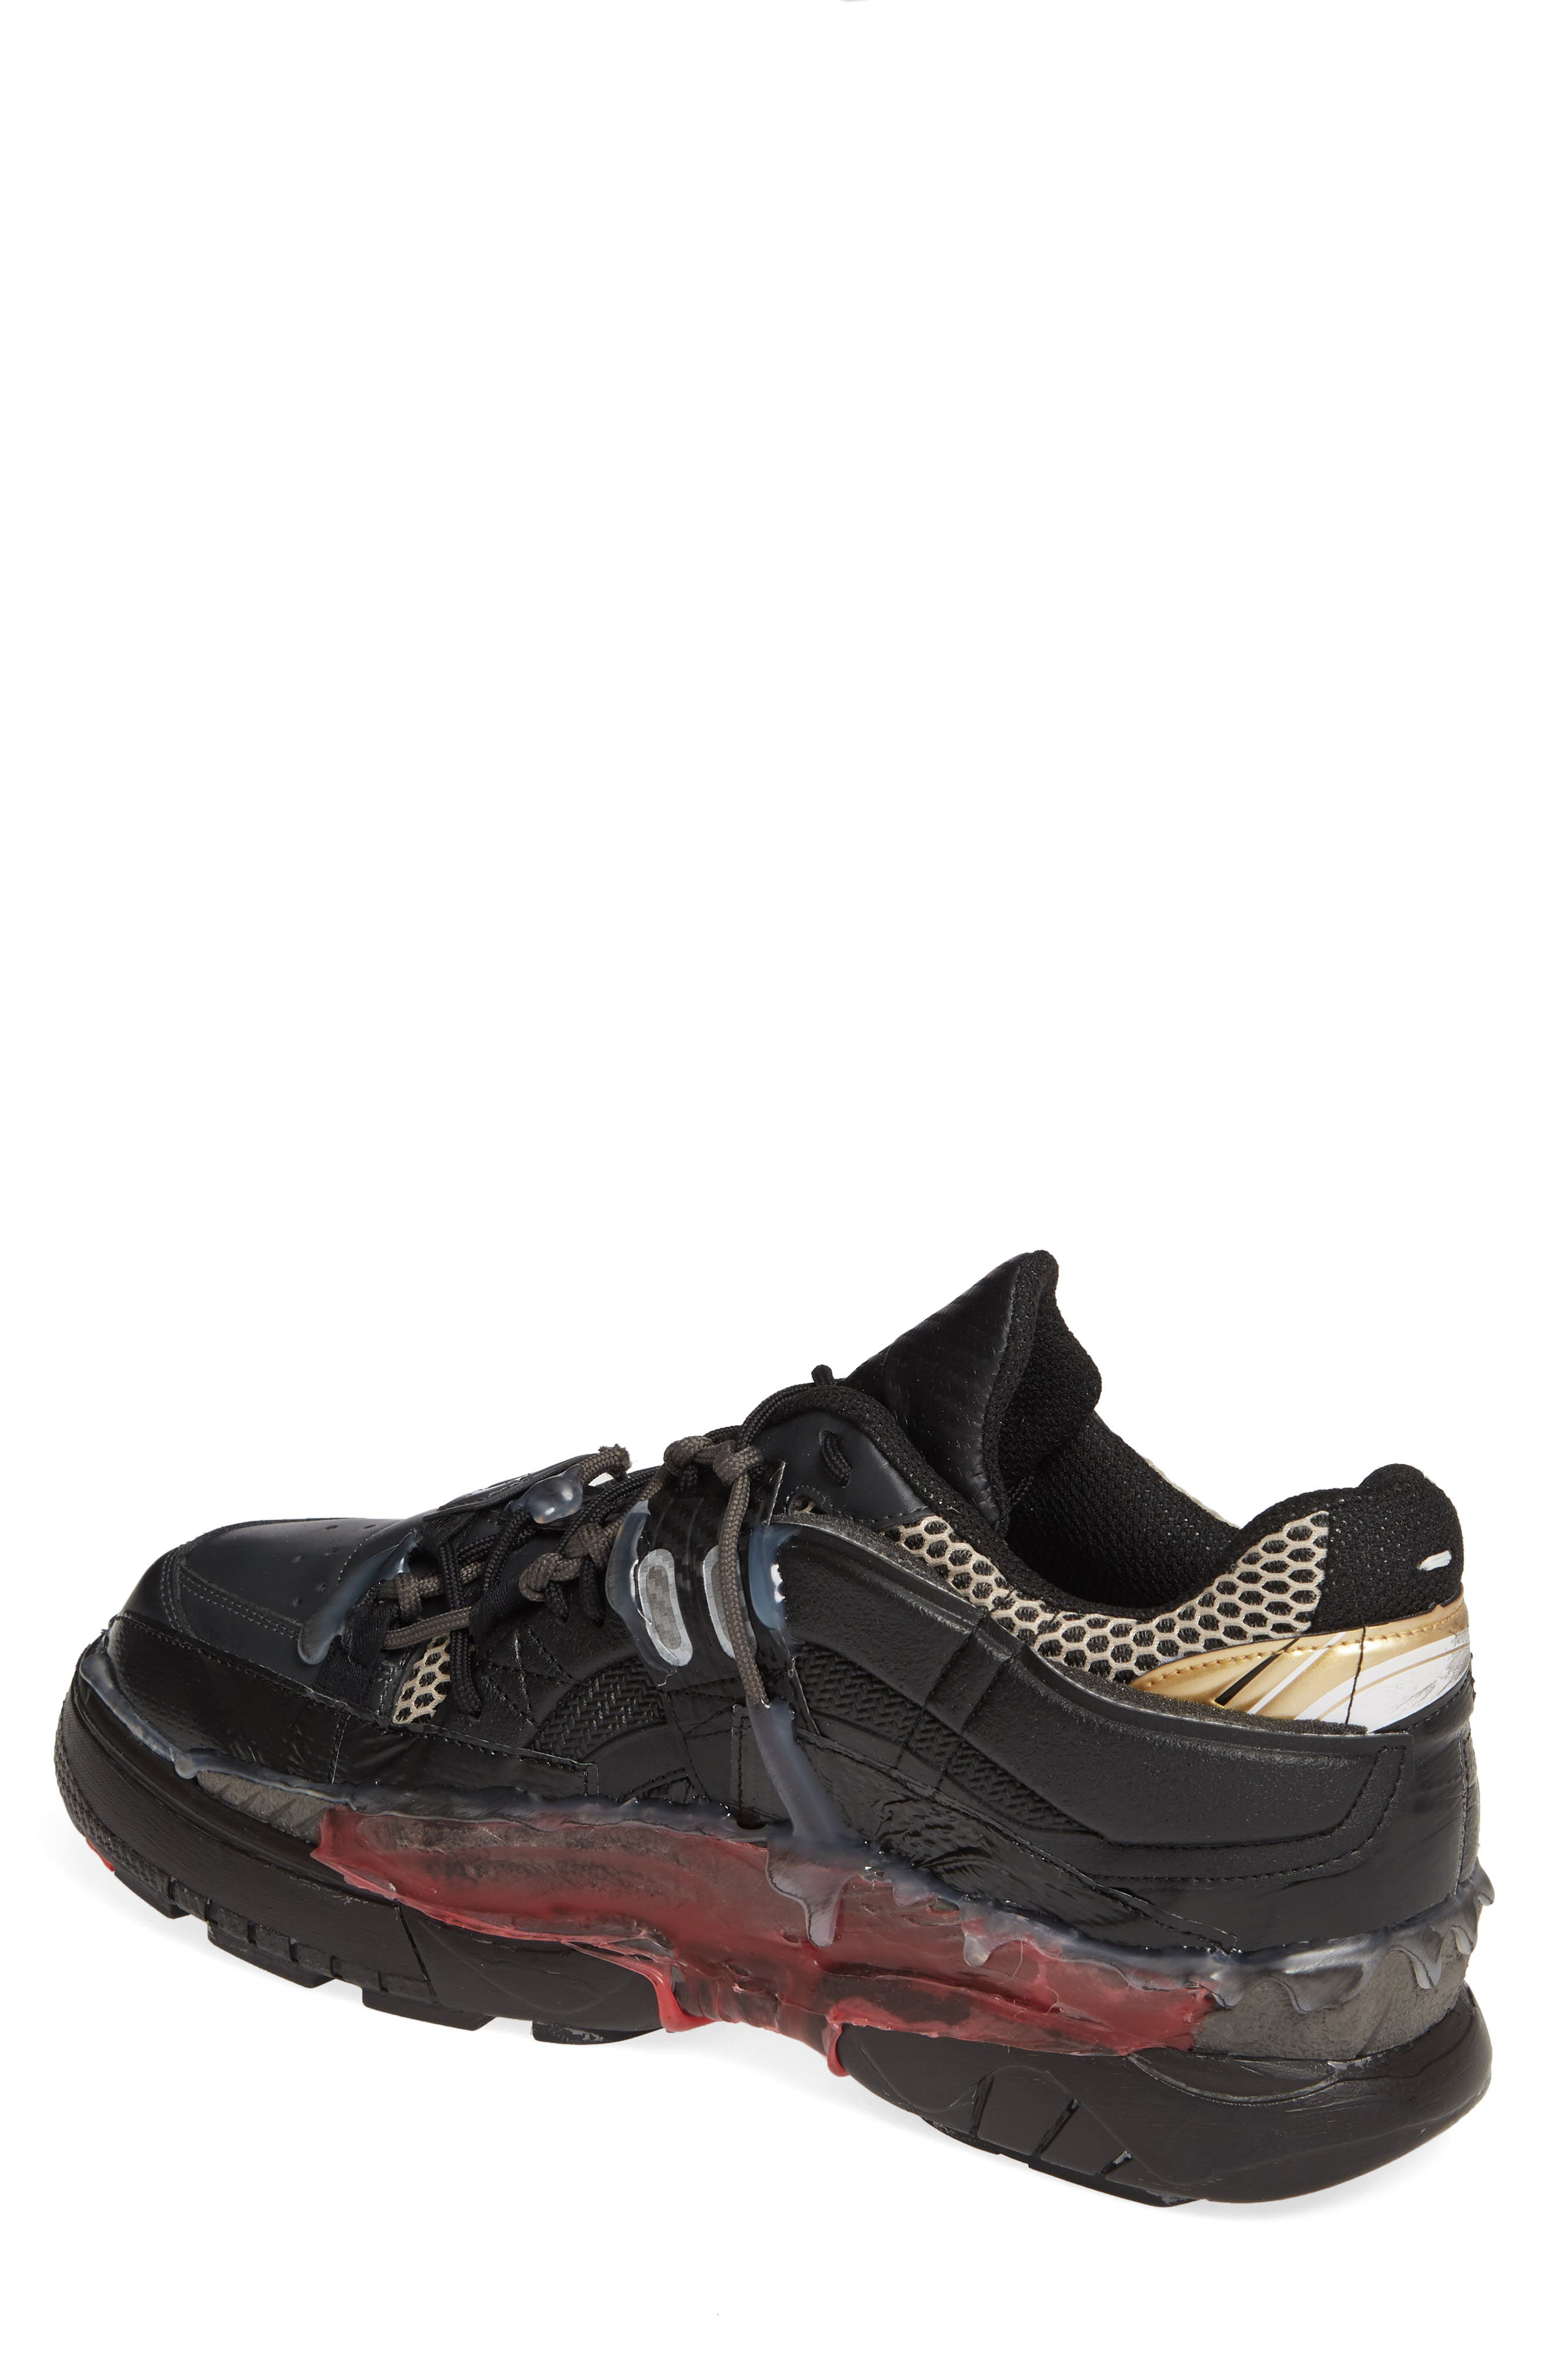 MM6 MAISON MARGIELA,                             Maison Margiela Fusion Sneaker,                             Alternate thumbnail 2, color,                             BLACK/ GOLD/ RED